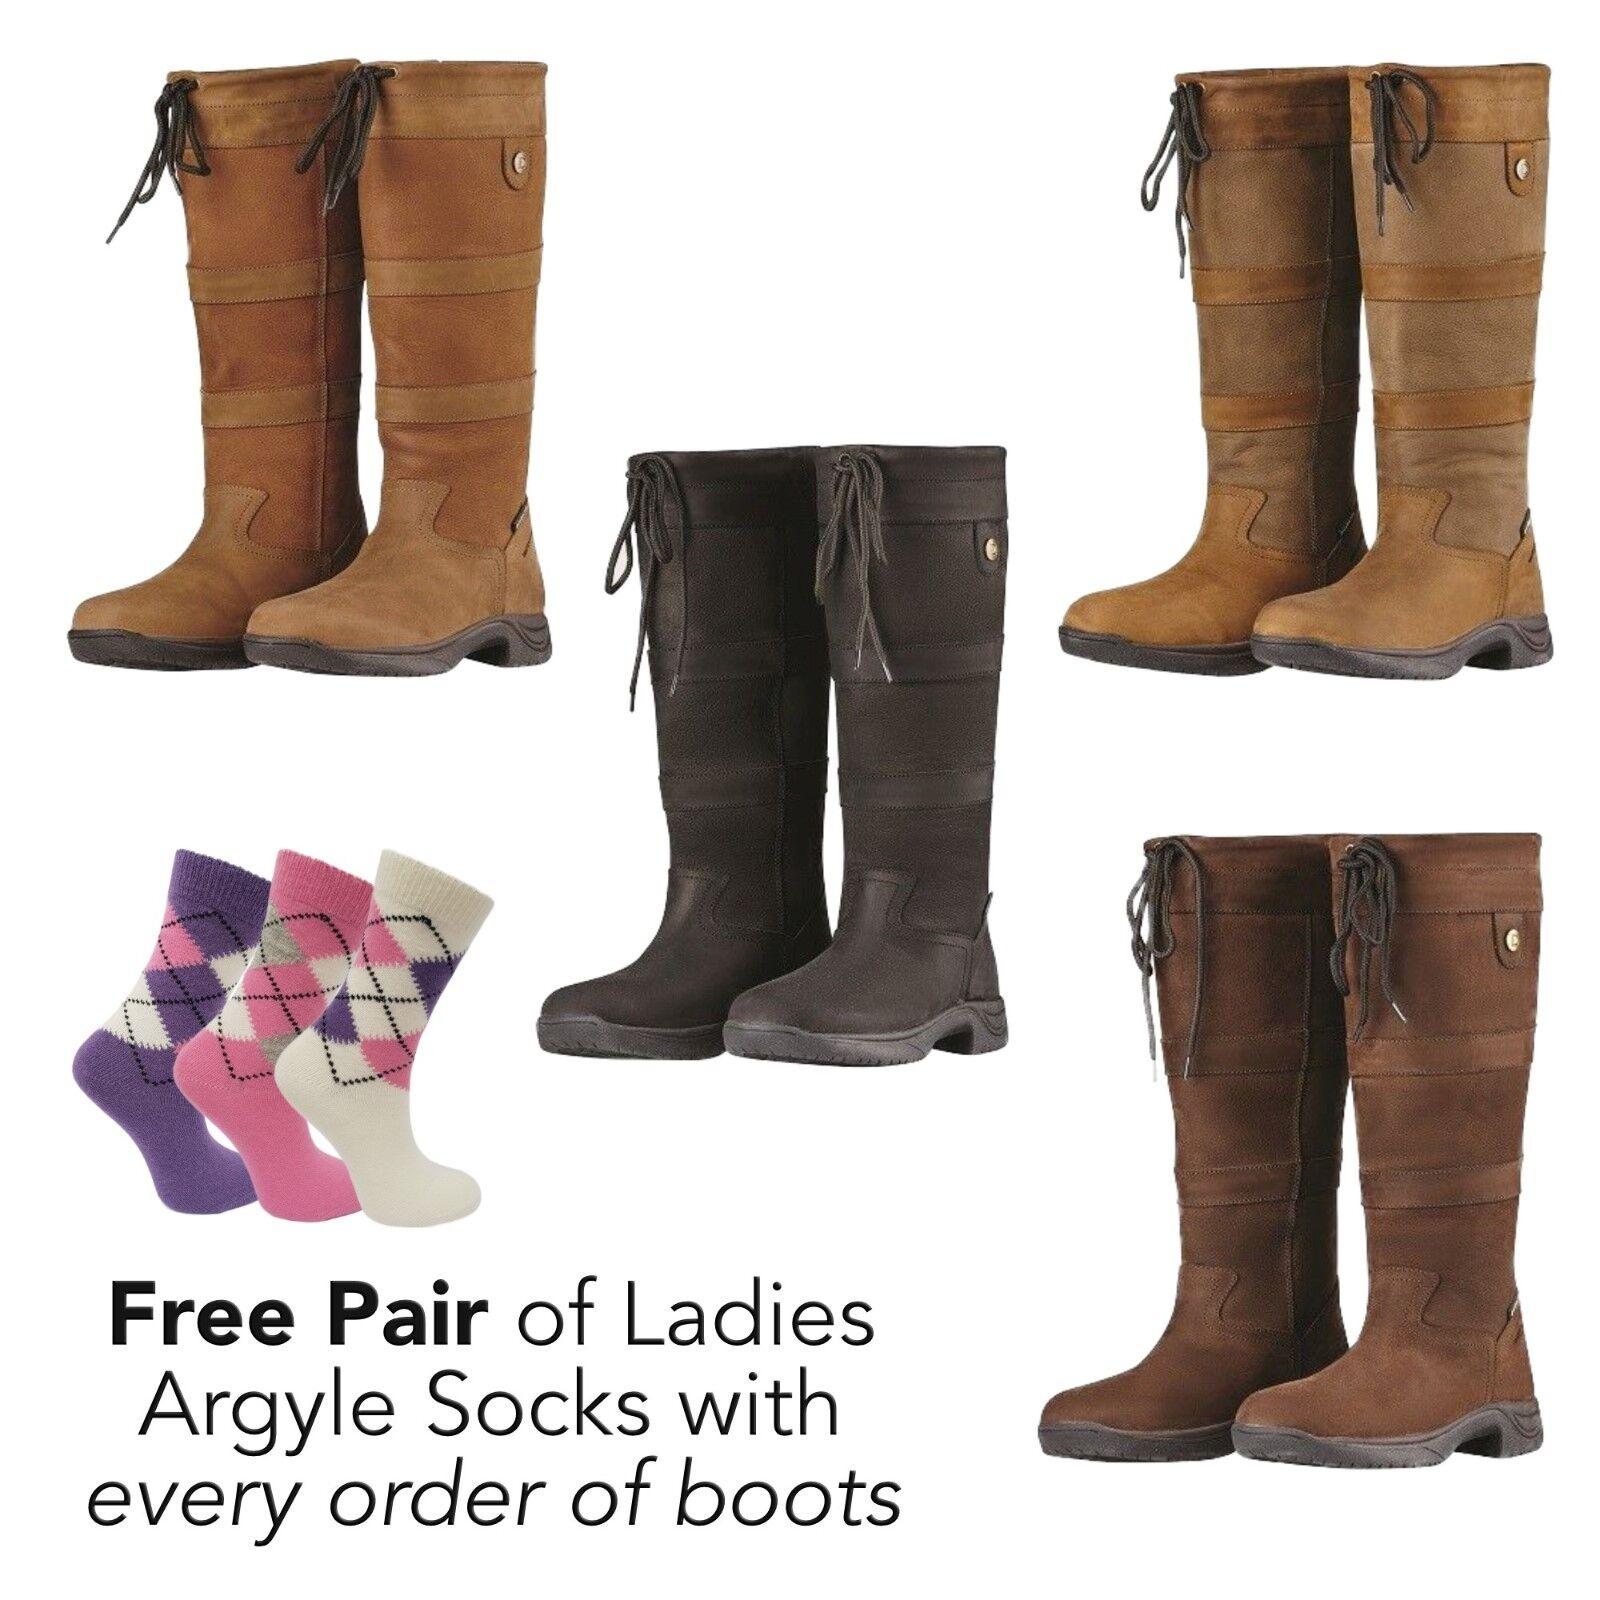 Dublin River Boots Waterproof Country Horse Riding Boot Reg Wide & X Wide Calf